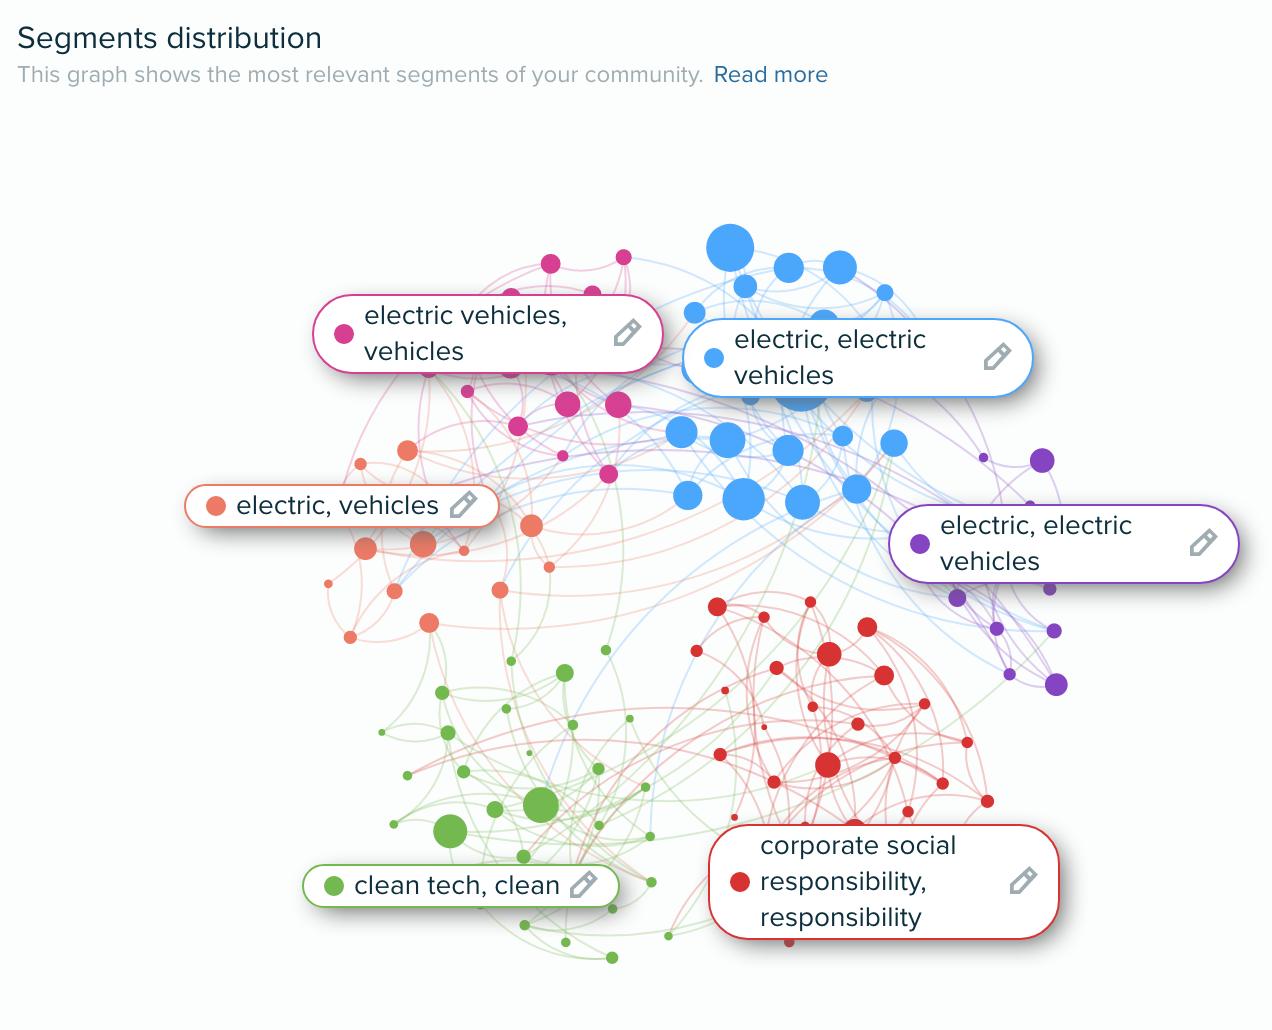 Audiense blog - Segments distribution